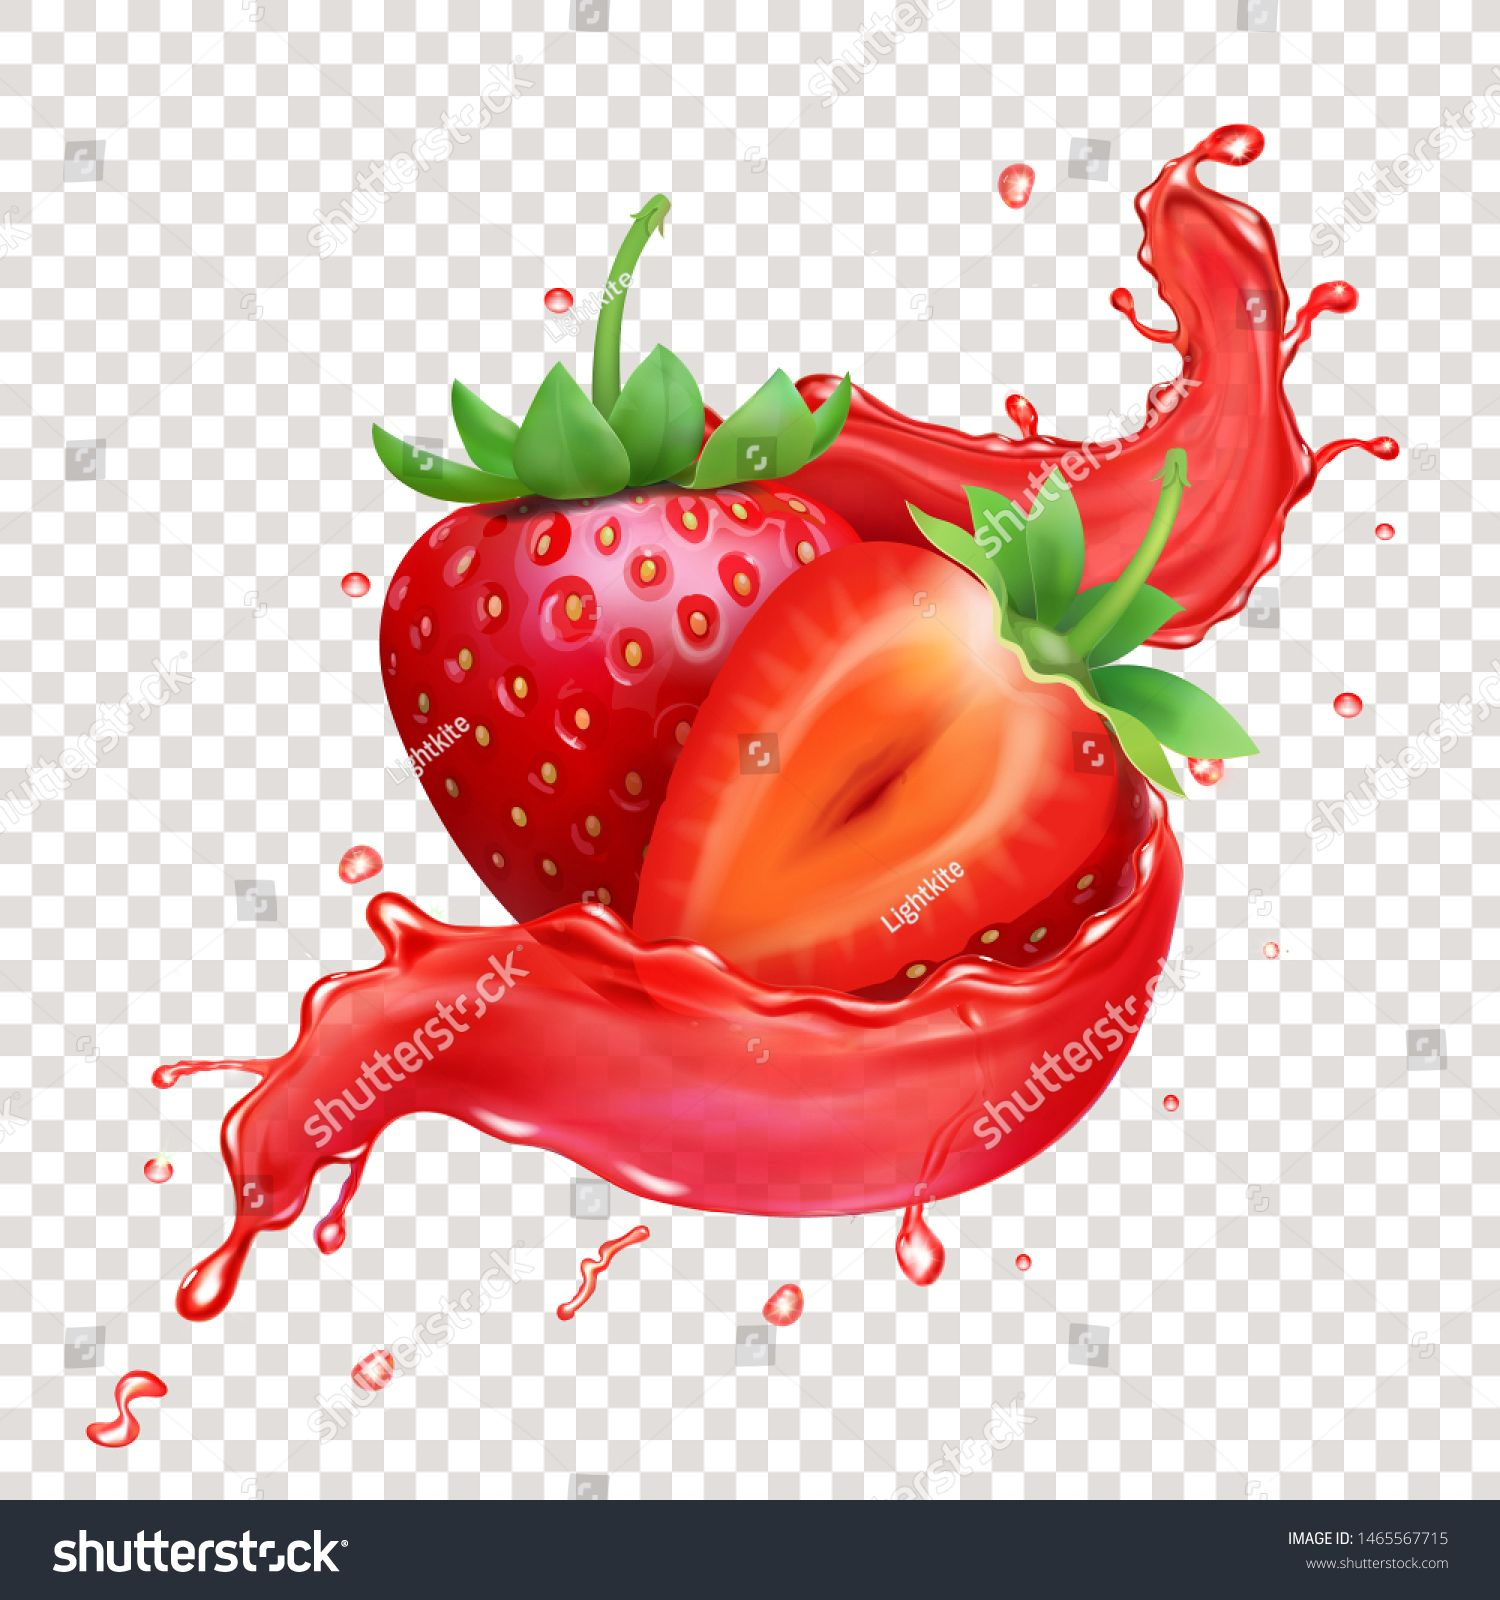 Strawberry 3d Realistic Transparent Splash Of Juice Royalty Free Images Vector Fruit Splash Strawberry Fruits Images